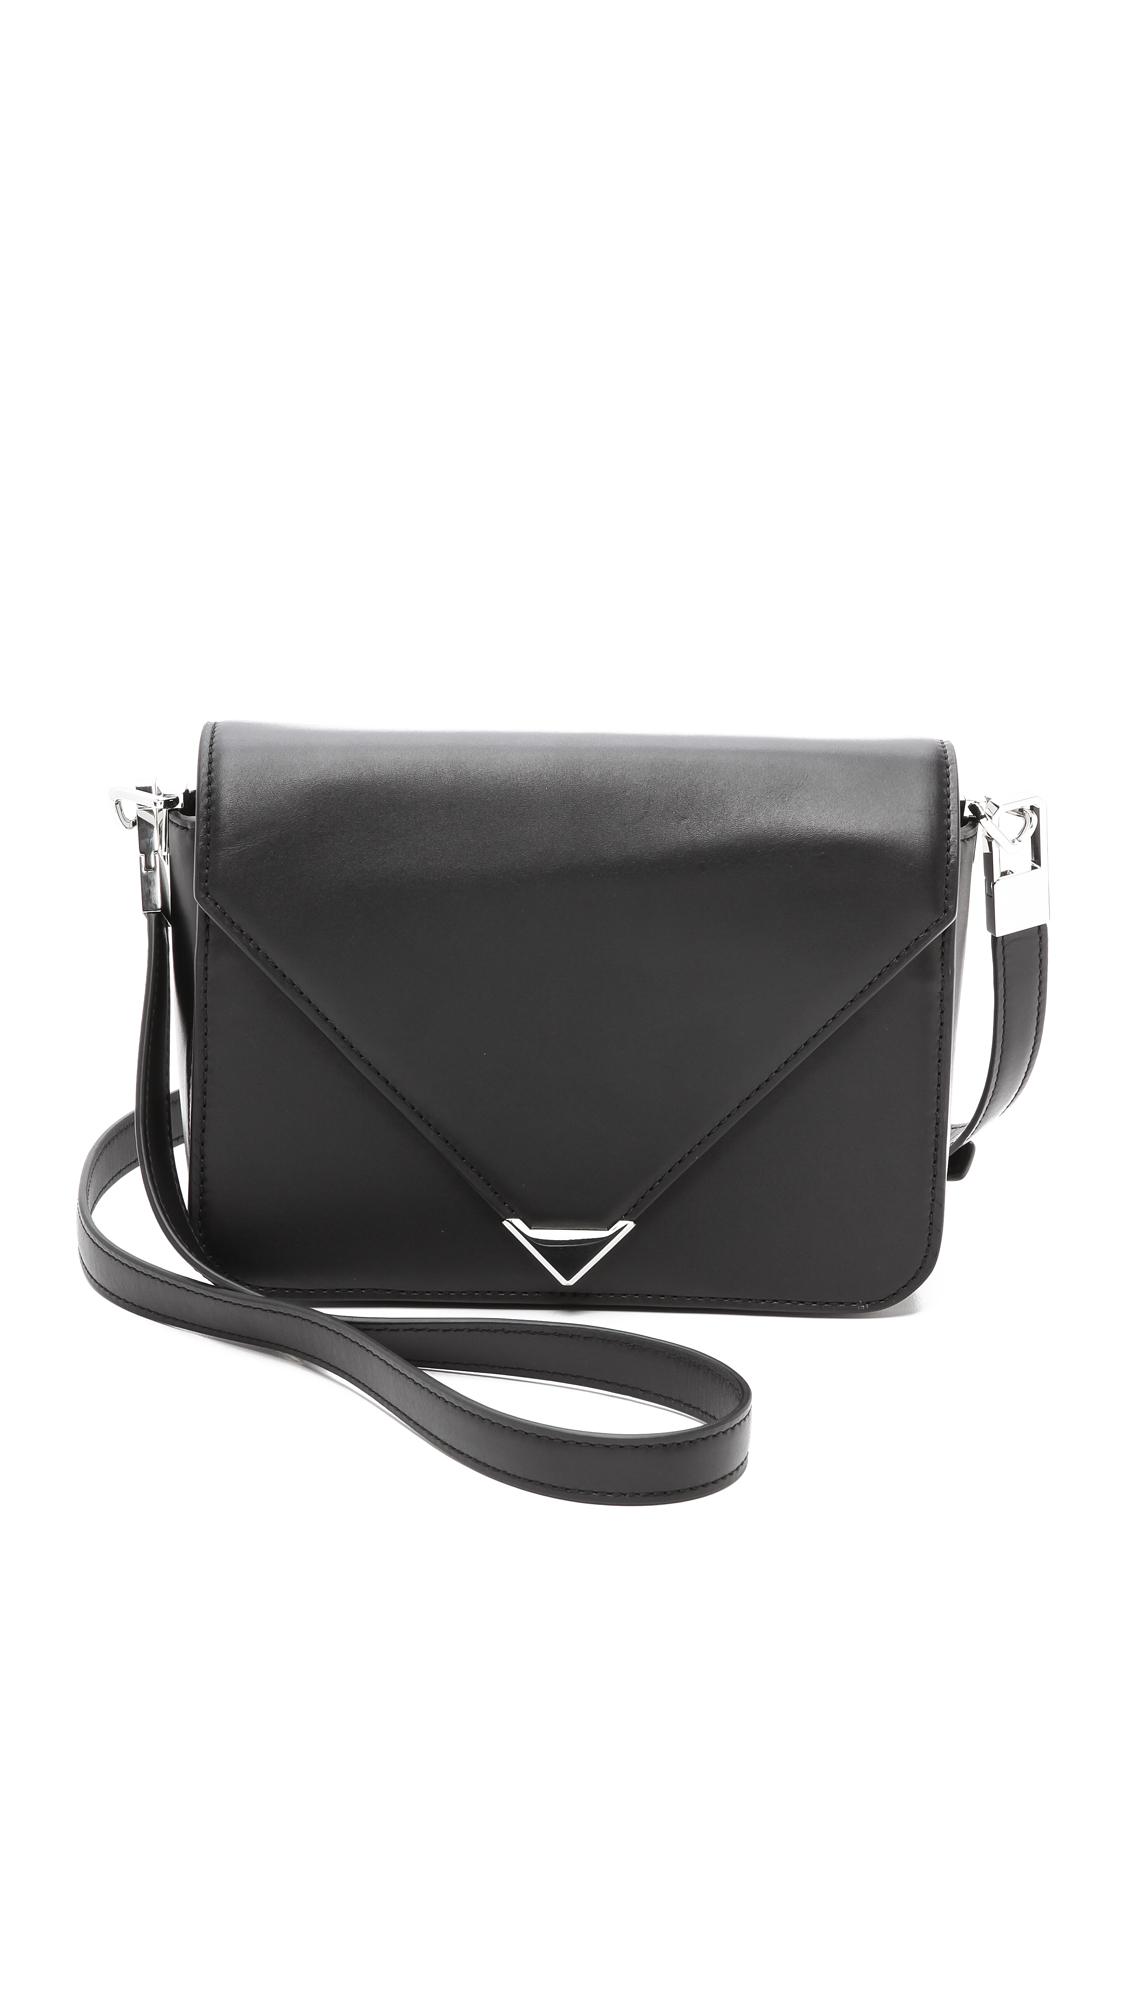 Alexander wang Prisma Envelope Small Sling Bag - Black in Black | Lyst